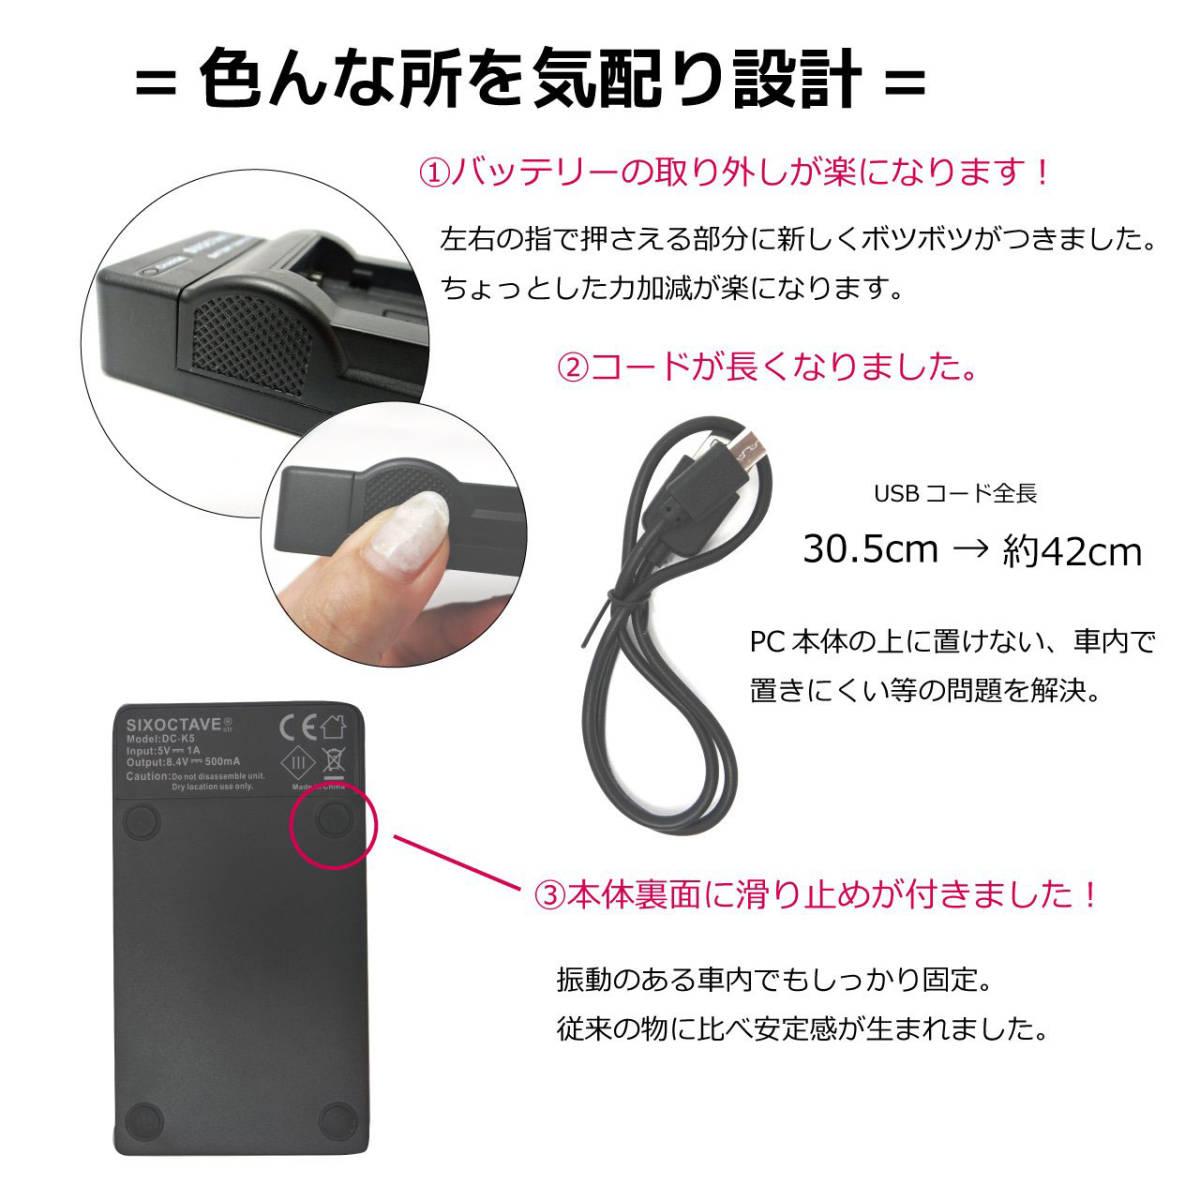 新品 NIKON ニコン EN-EL9 / EN-EL9a 互換バッテリー 2個& 急速互換充電器 USBチャージャー MH-23 D40X / D3000 / D5000 / D60 / D40_画像5